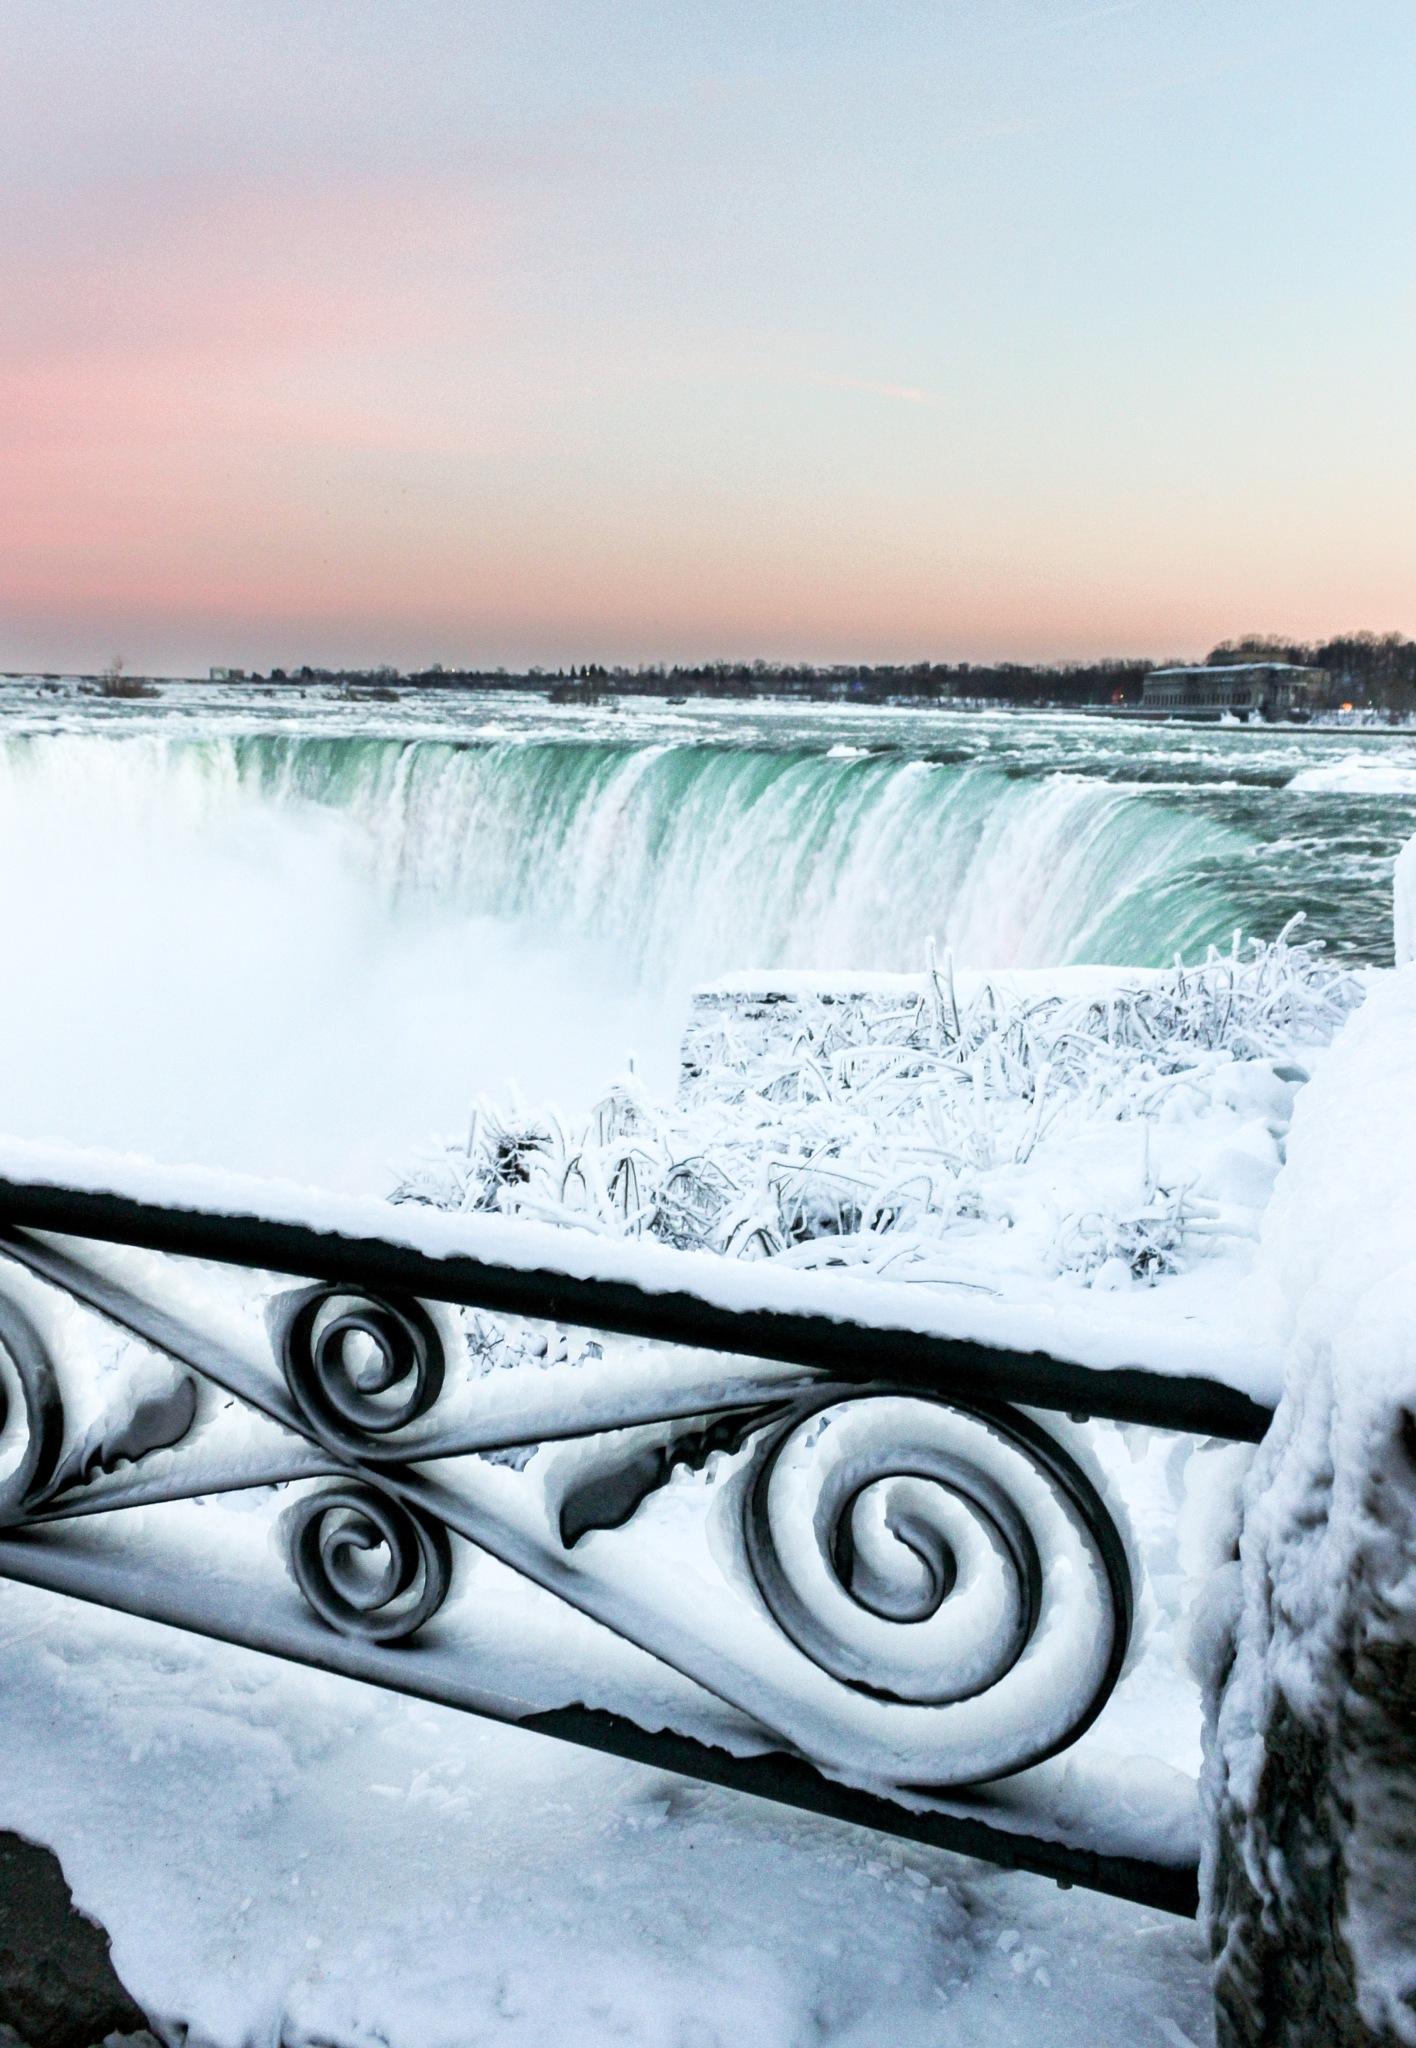 Niagara falls by Luke Boland